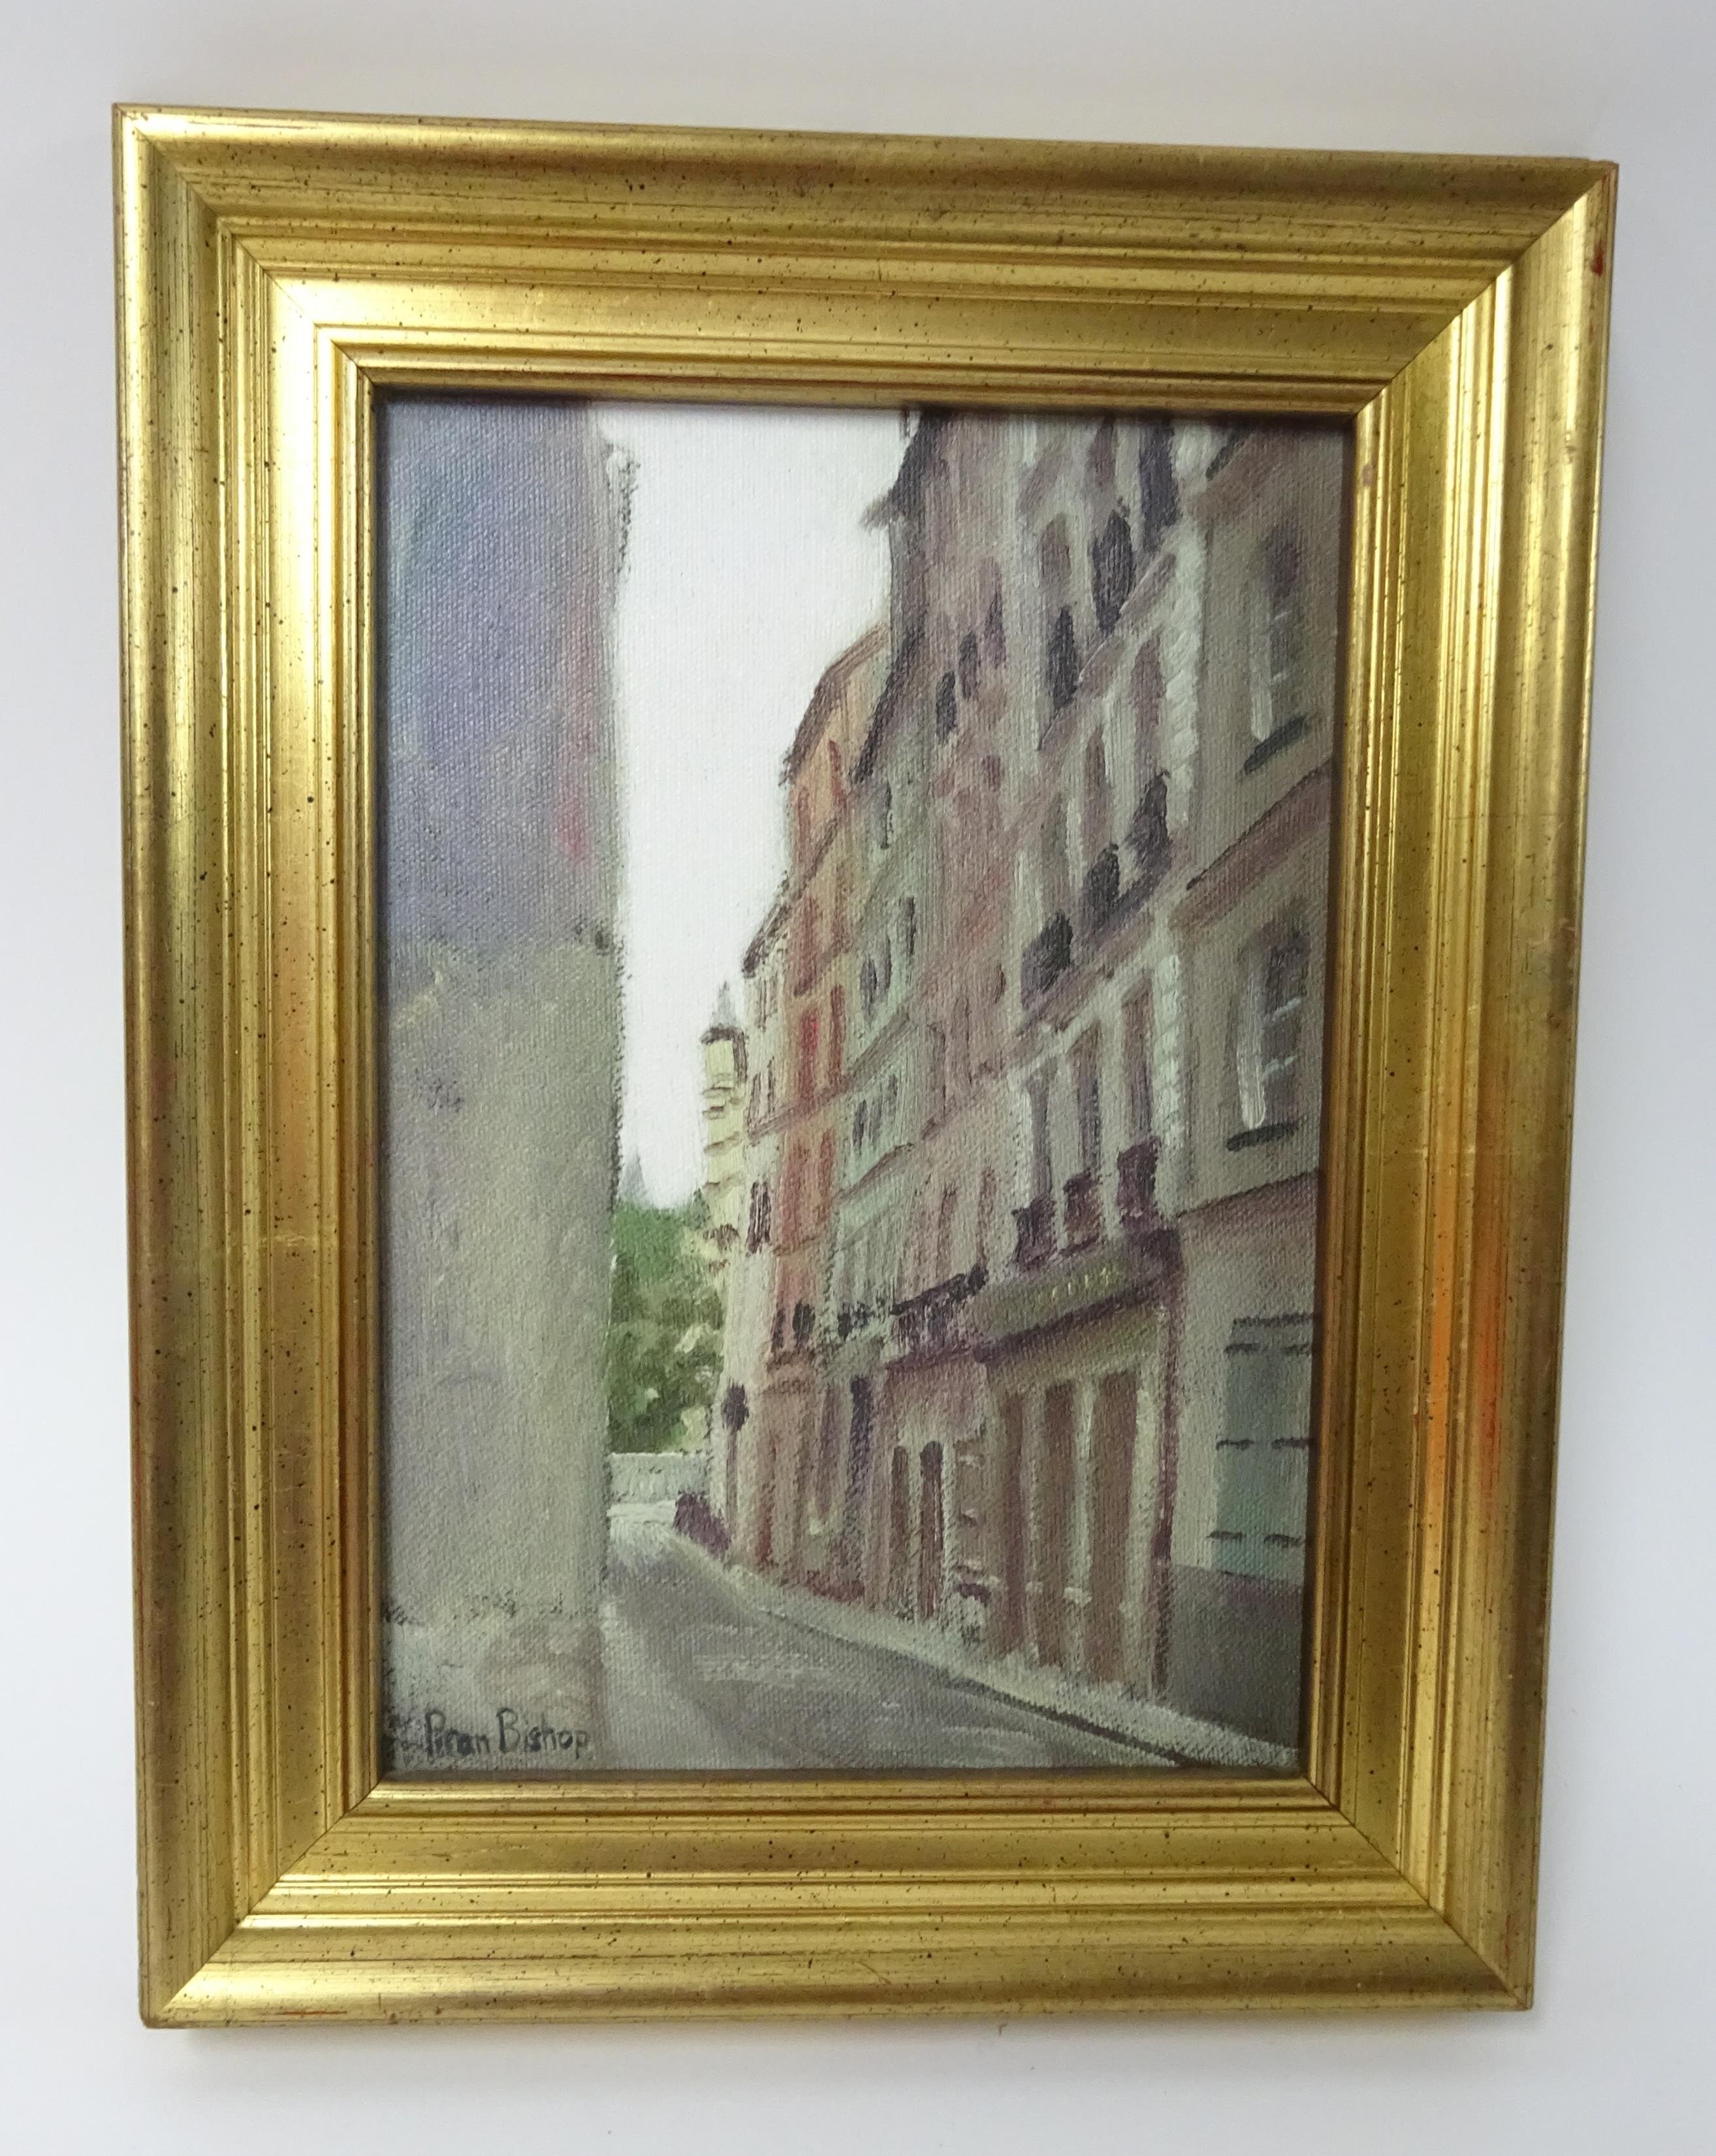 Lot 026 - Piran Bishop, print 'The Beat Hotel' 24cm x 16.5cm , framed.